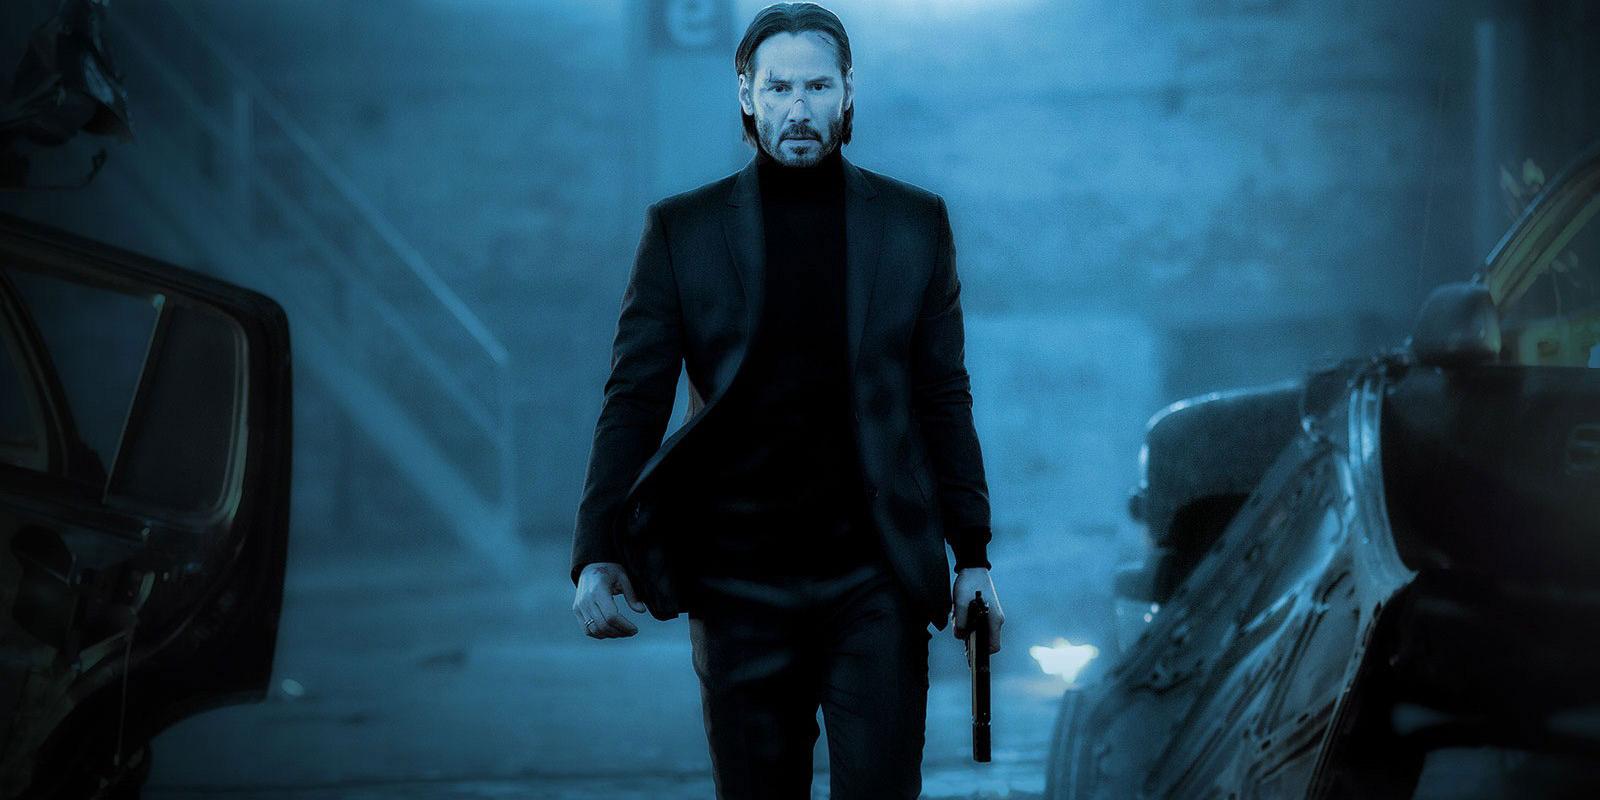 John Wick 2: Keanu Reeves Offers Story Details